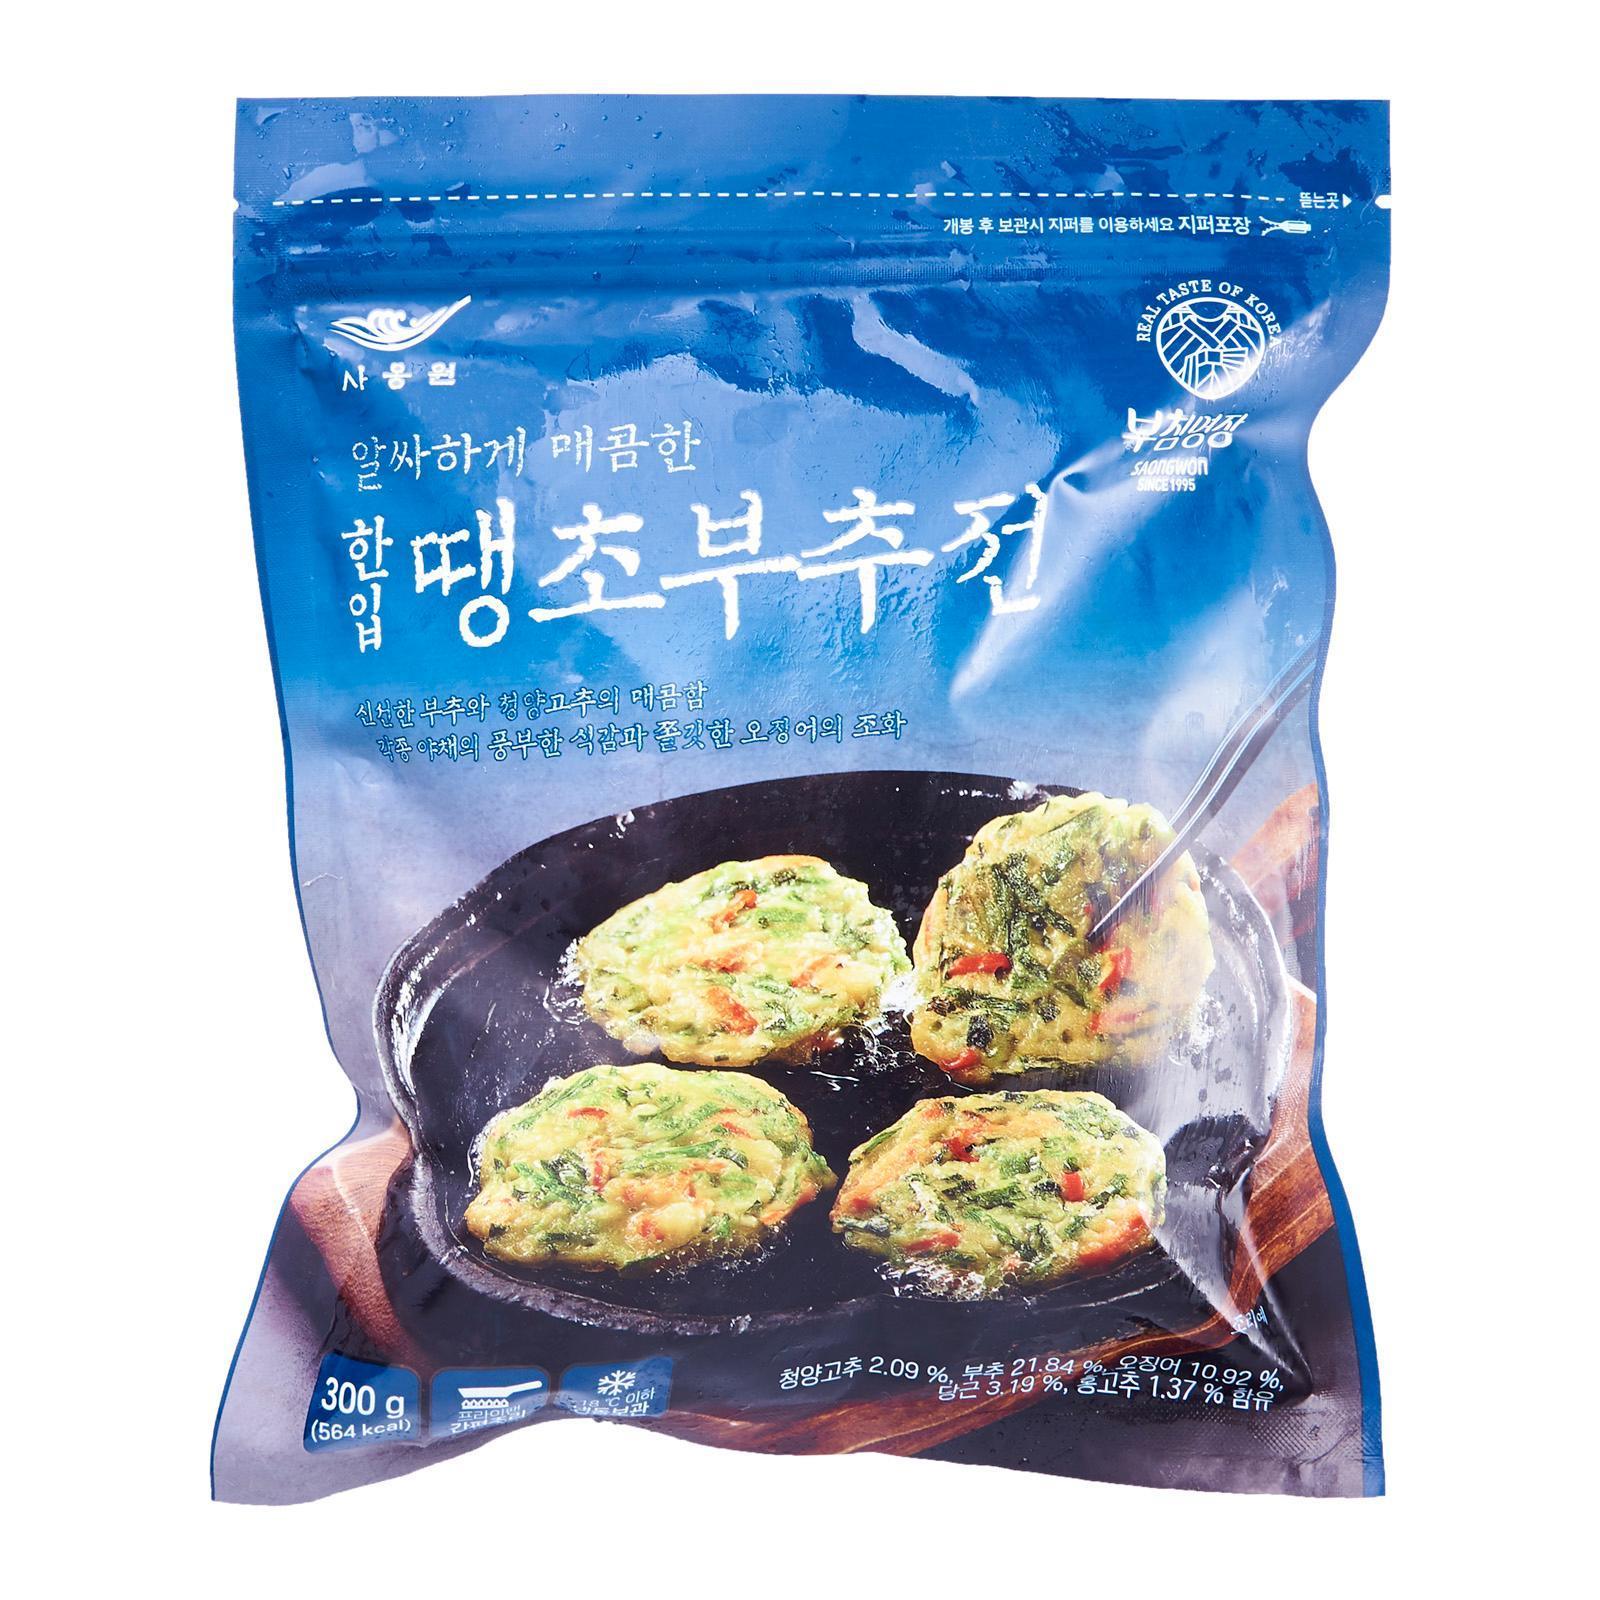 Saongwon Korean Spicy Leek Mini Pancake - Frozen